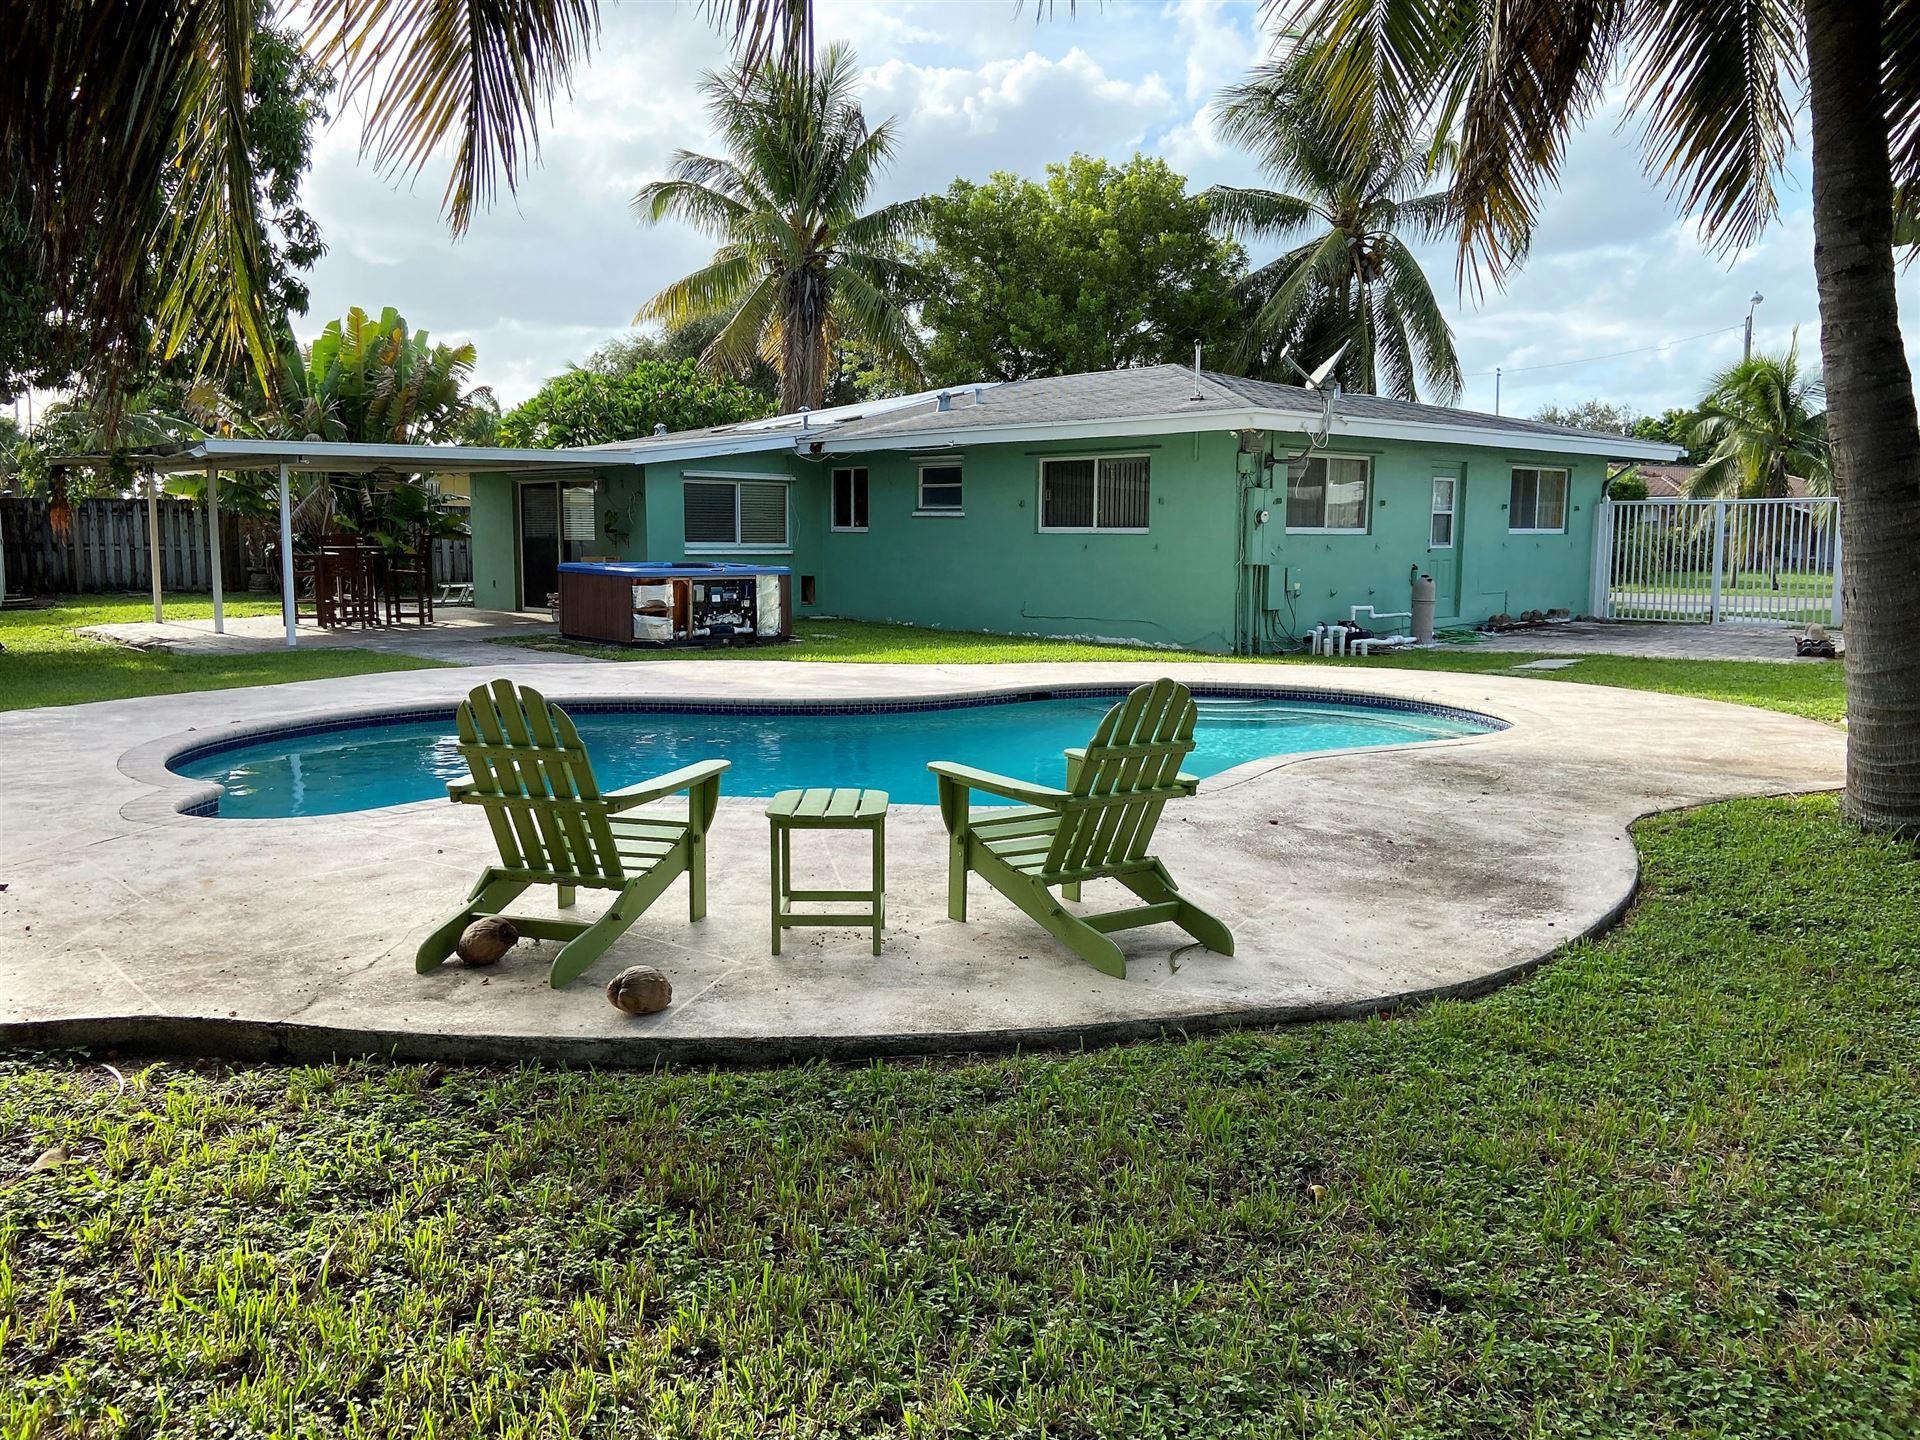 Photo of 260 SE 5th Court, Pompano Beach, FL 33060 (MLS # RX-10657423)